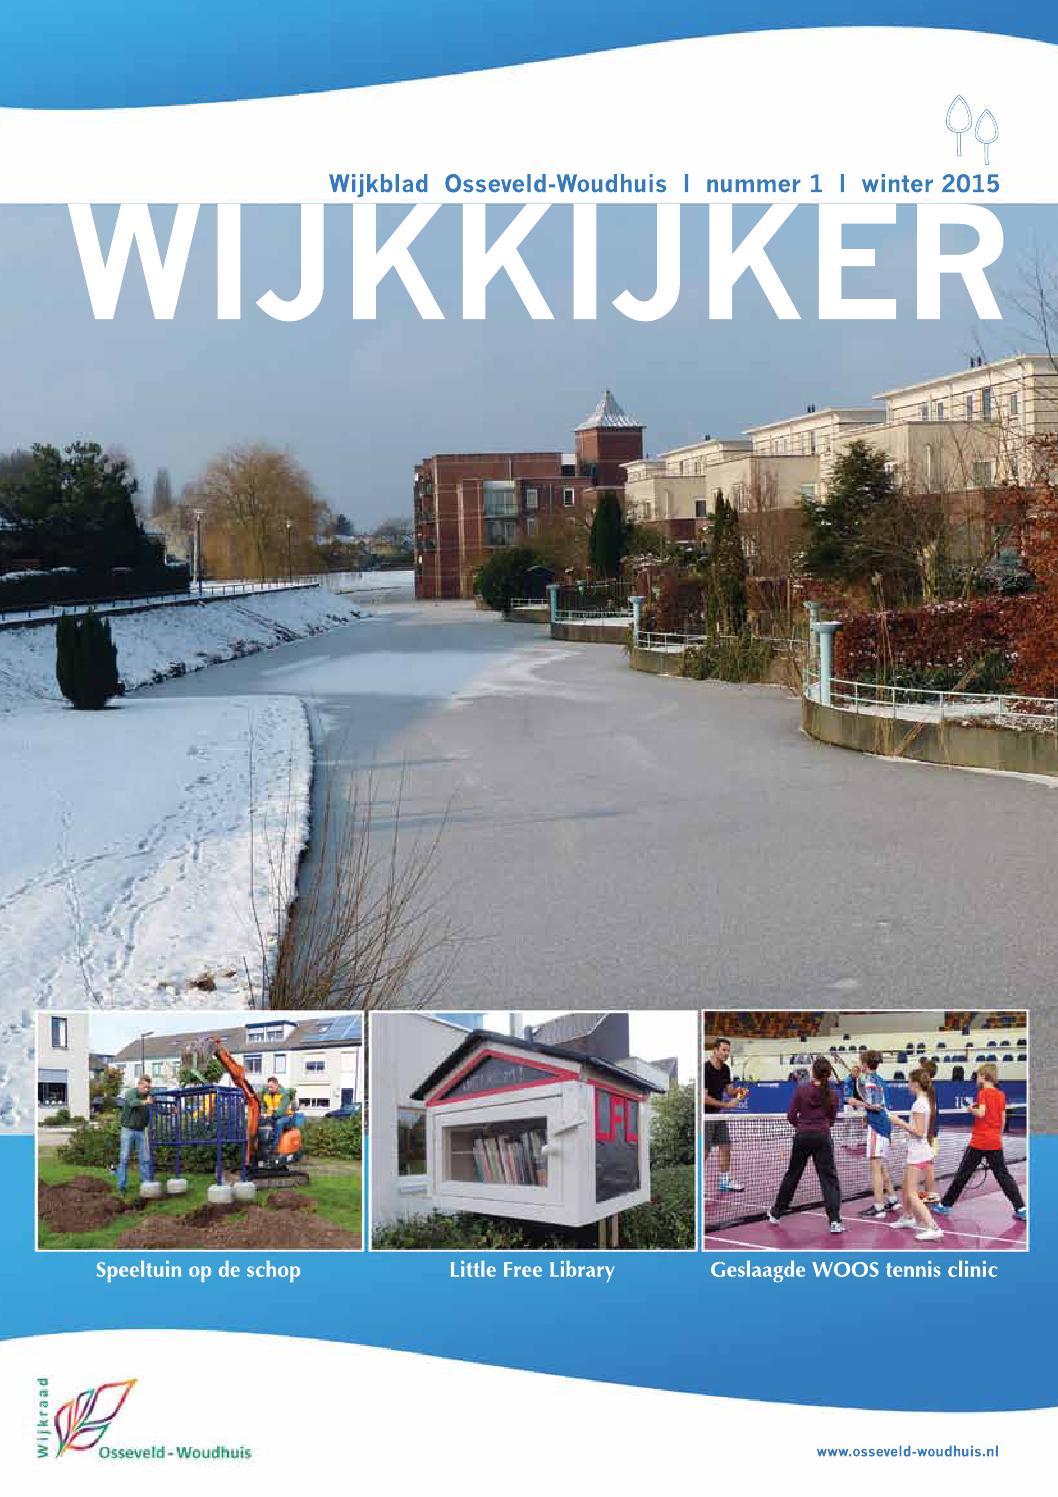 Winter 2016 wijkkijker by portfolio bijbeeld - issuu